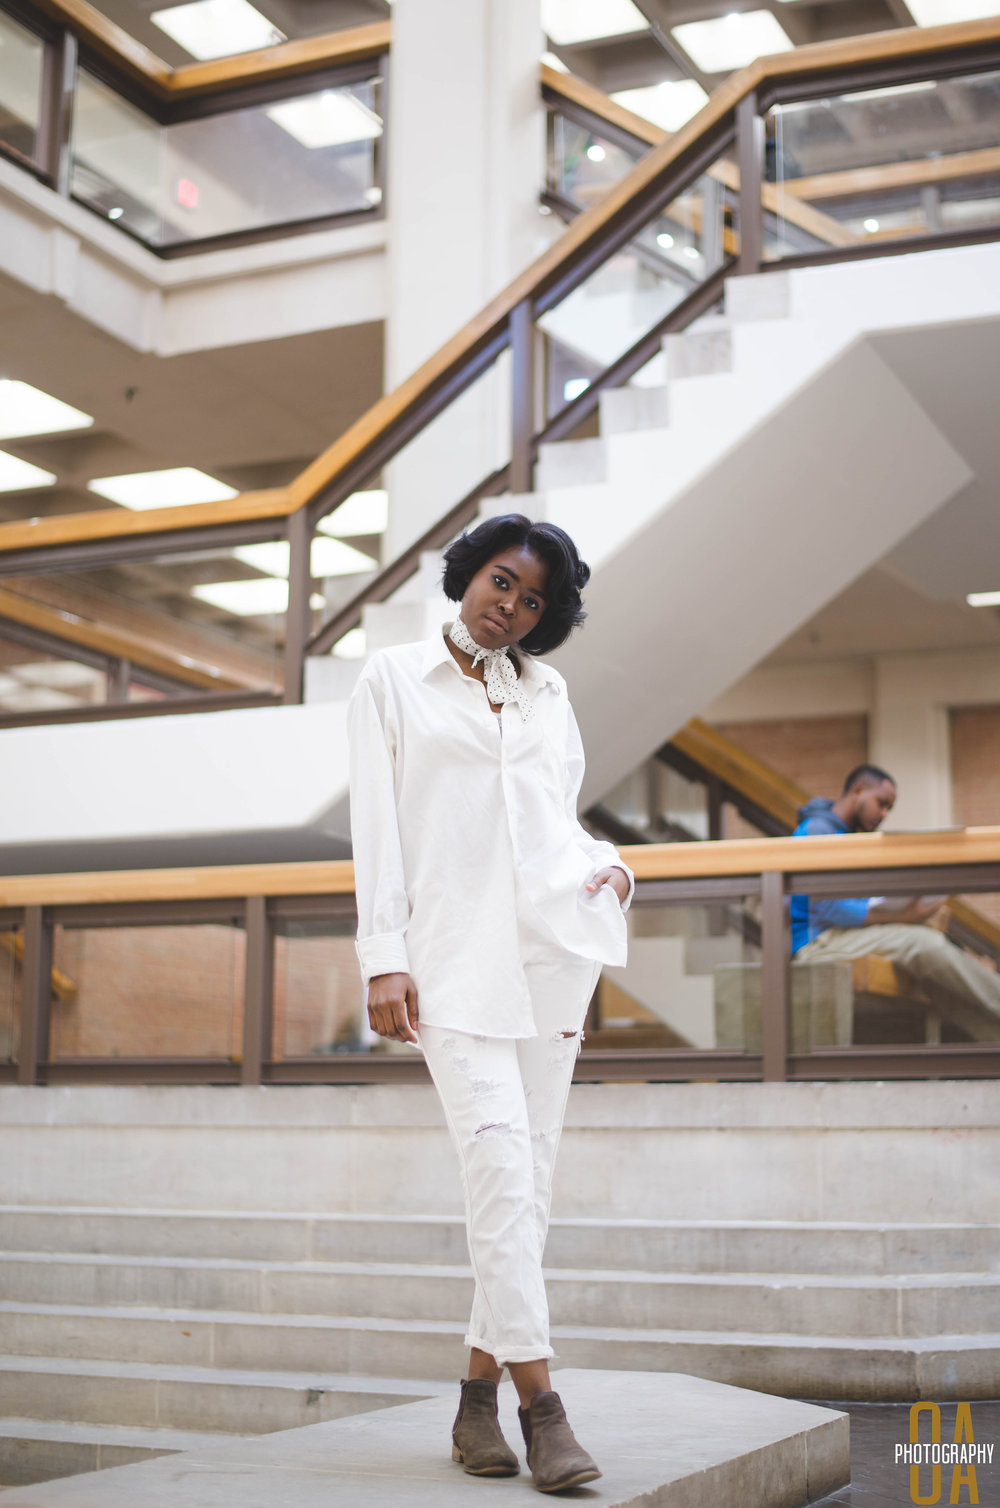 Photographer: Olasubomi Adesoye , Creative Director: Cheyenne Fogg & Chioma Agbaraji, Model: Mariama Bah